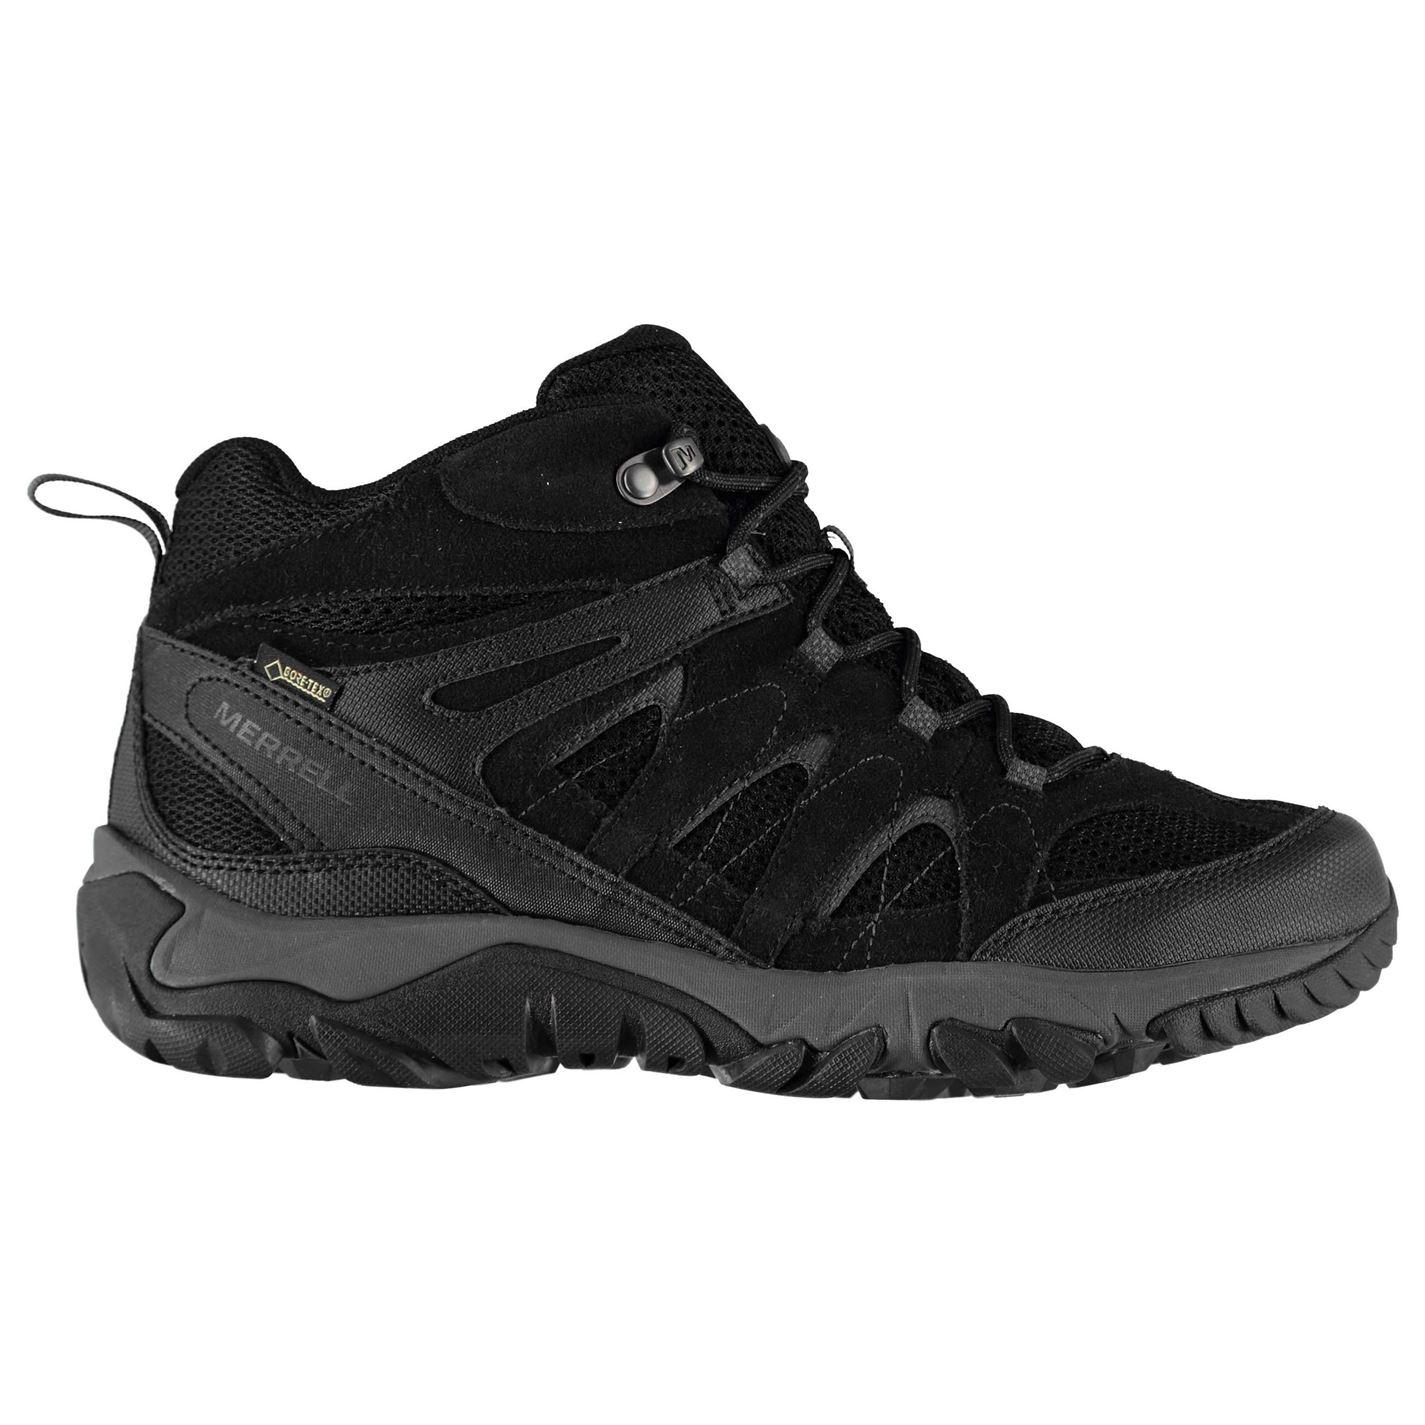 1d5a2018ab Outdoor cipő Merrell Outmost Ventilator GTX Mens Walking Boots ...